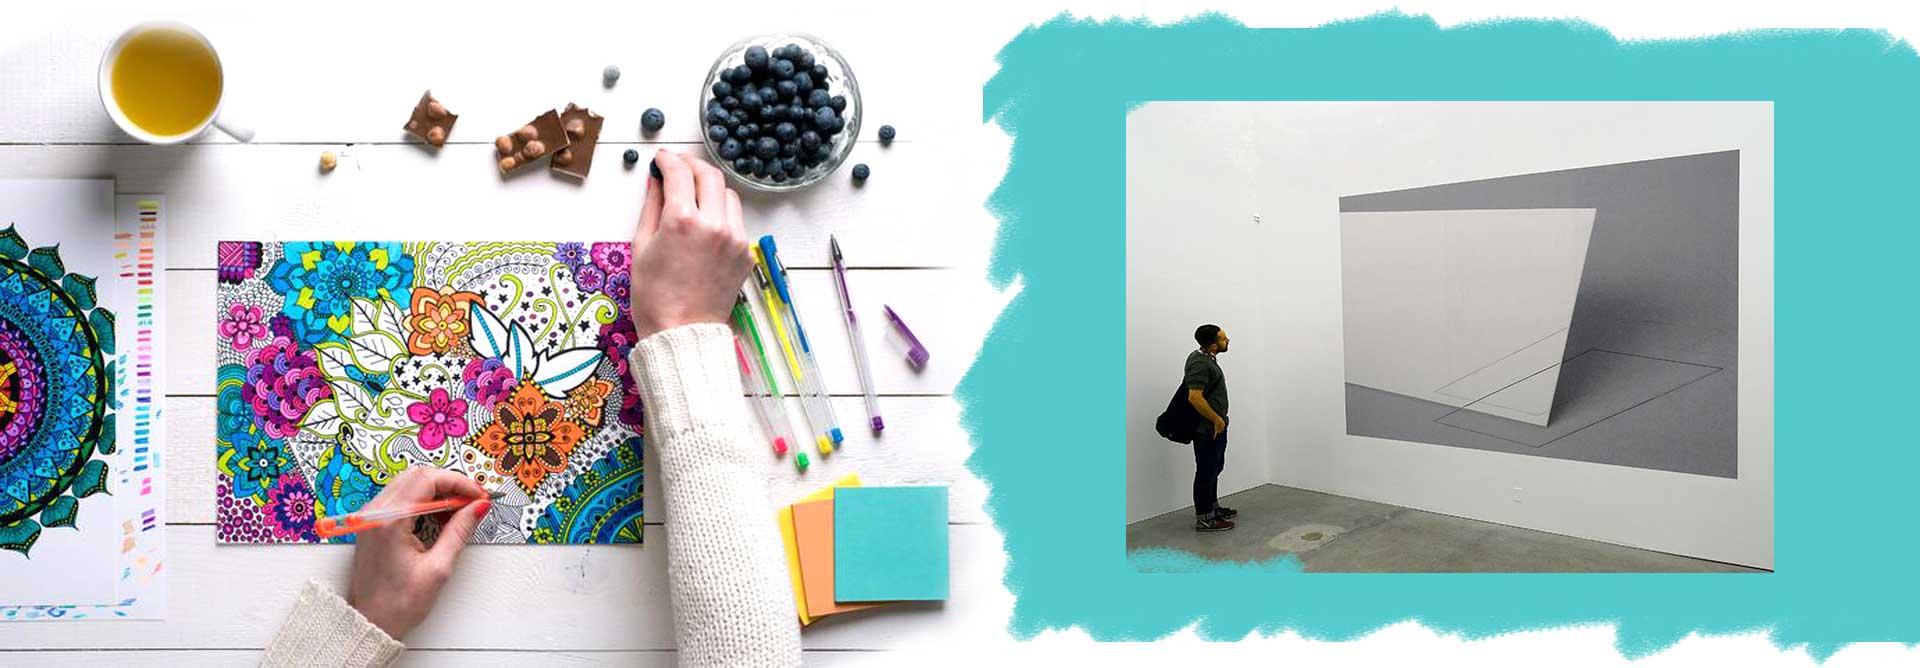 professiona1 photographe 10a - ۹۹ روش برای فروش آثار هنری